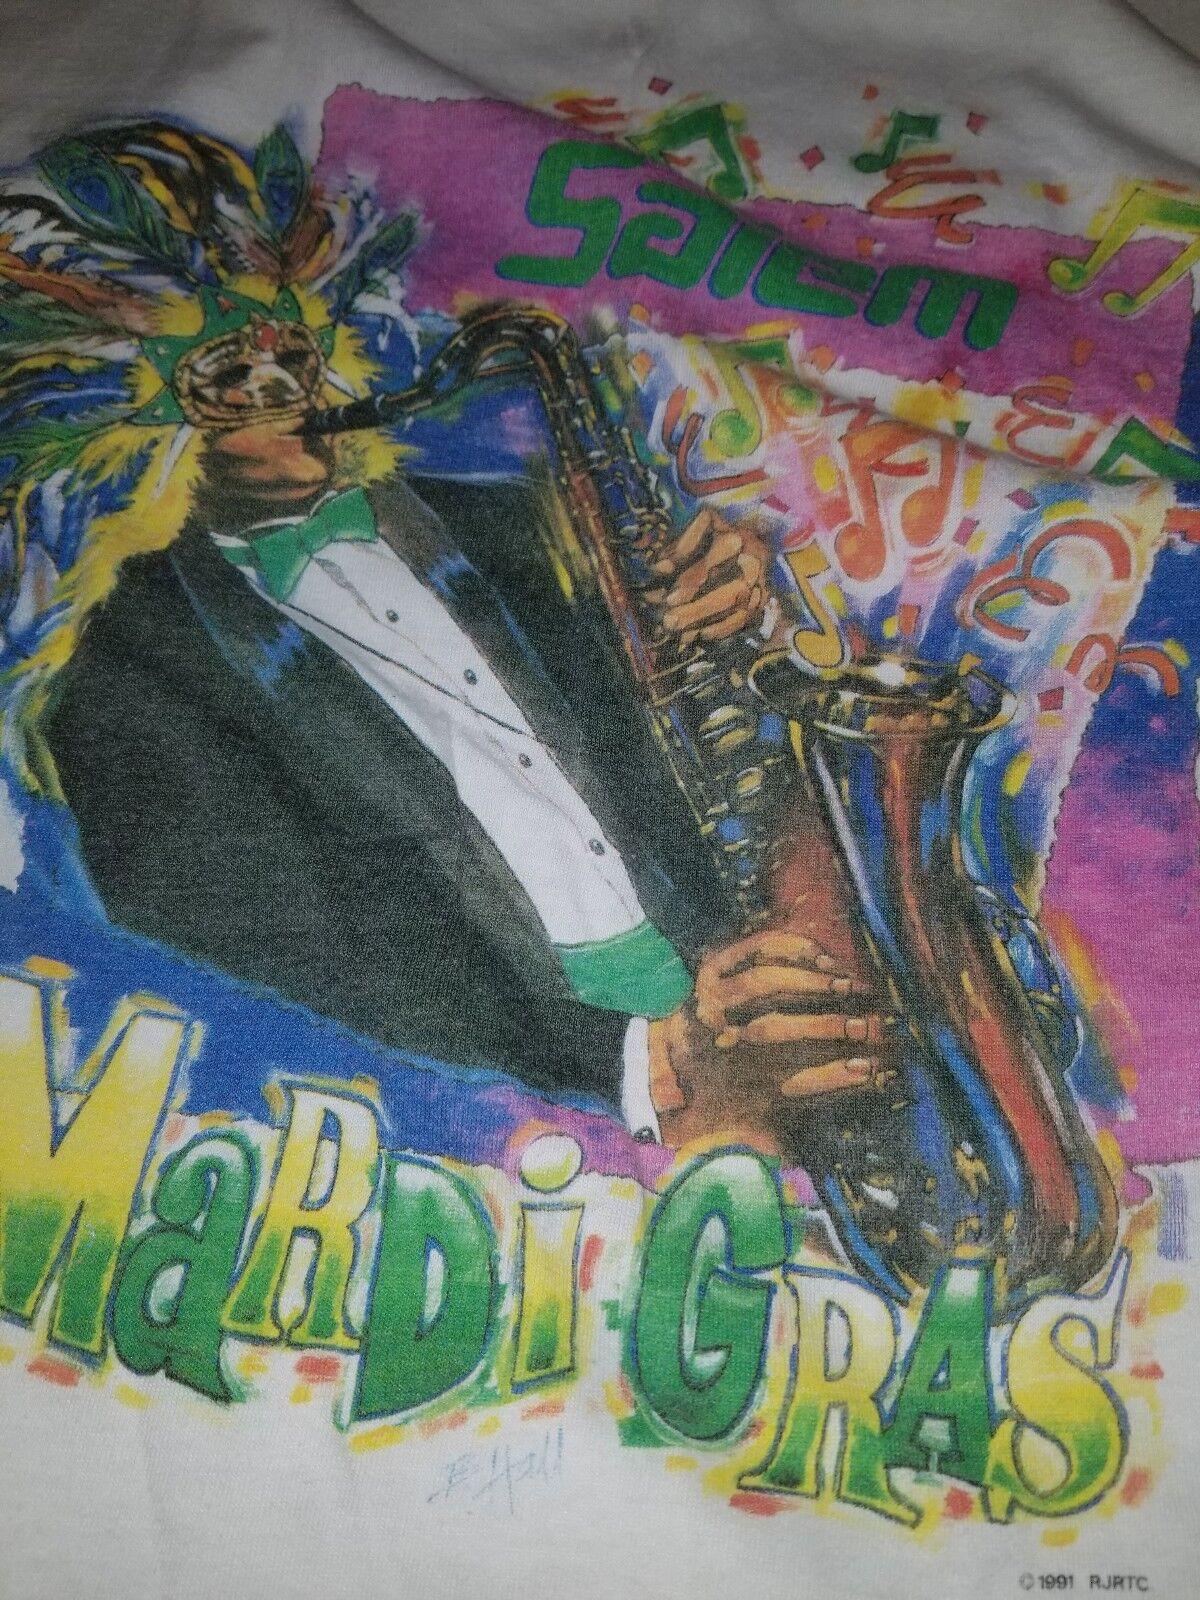 Mardi gras new Orleans 1992 Salem Cigarettes Big Graphic Shirt XL VTG 90s USA